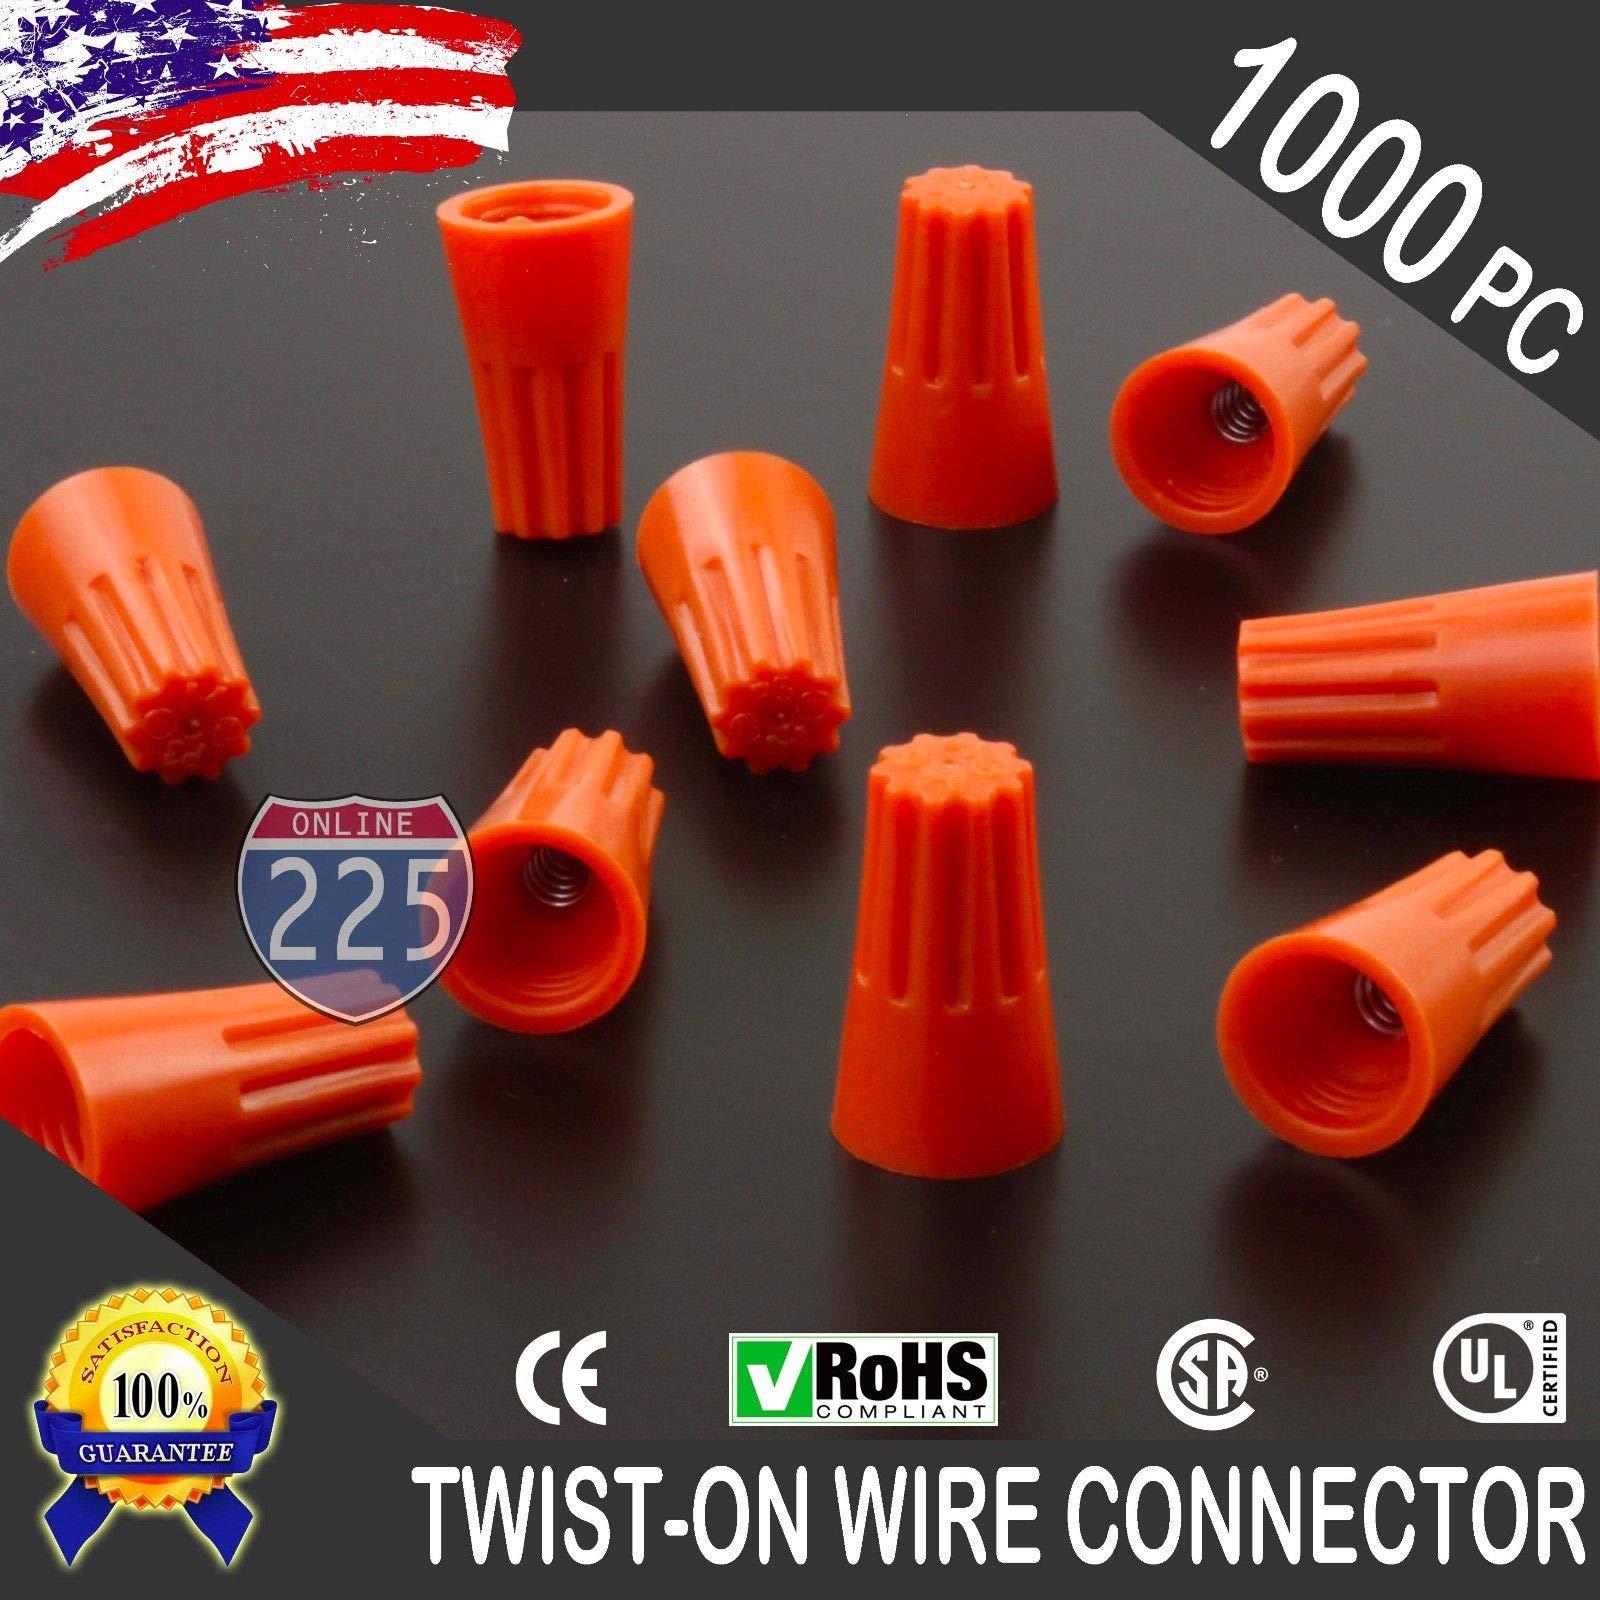 1000 PCS Orange 22-14 Gauge Twist On Wire Gard Connectors Conical Nuts Barrel Screw US